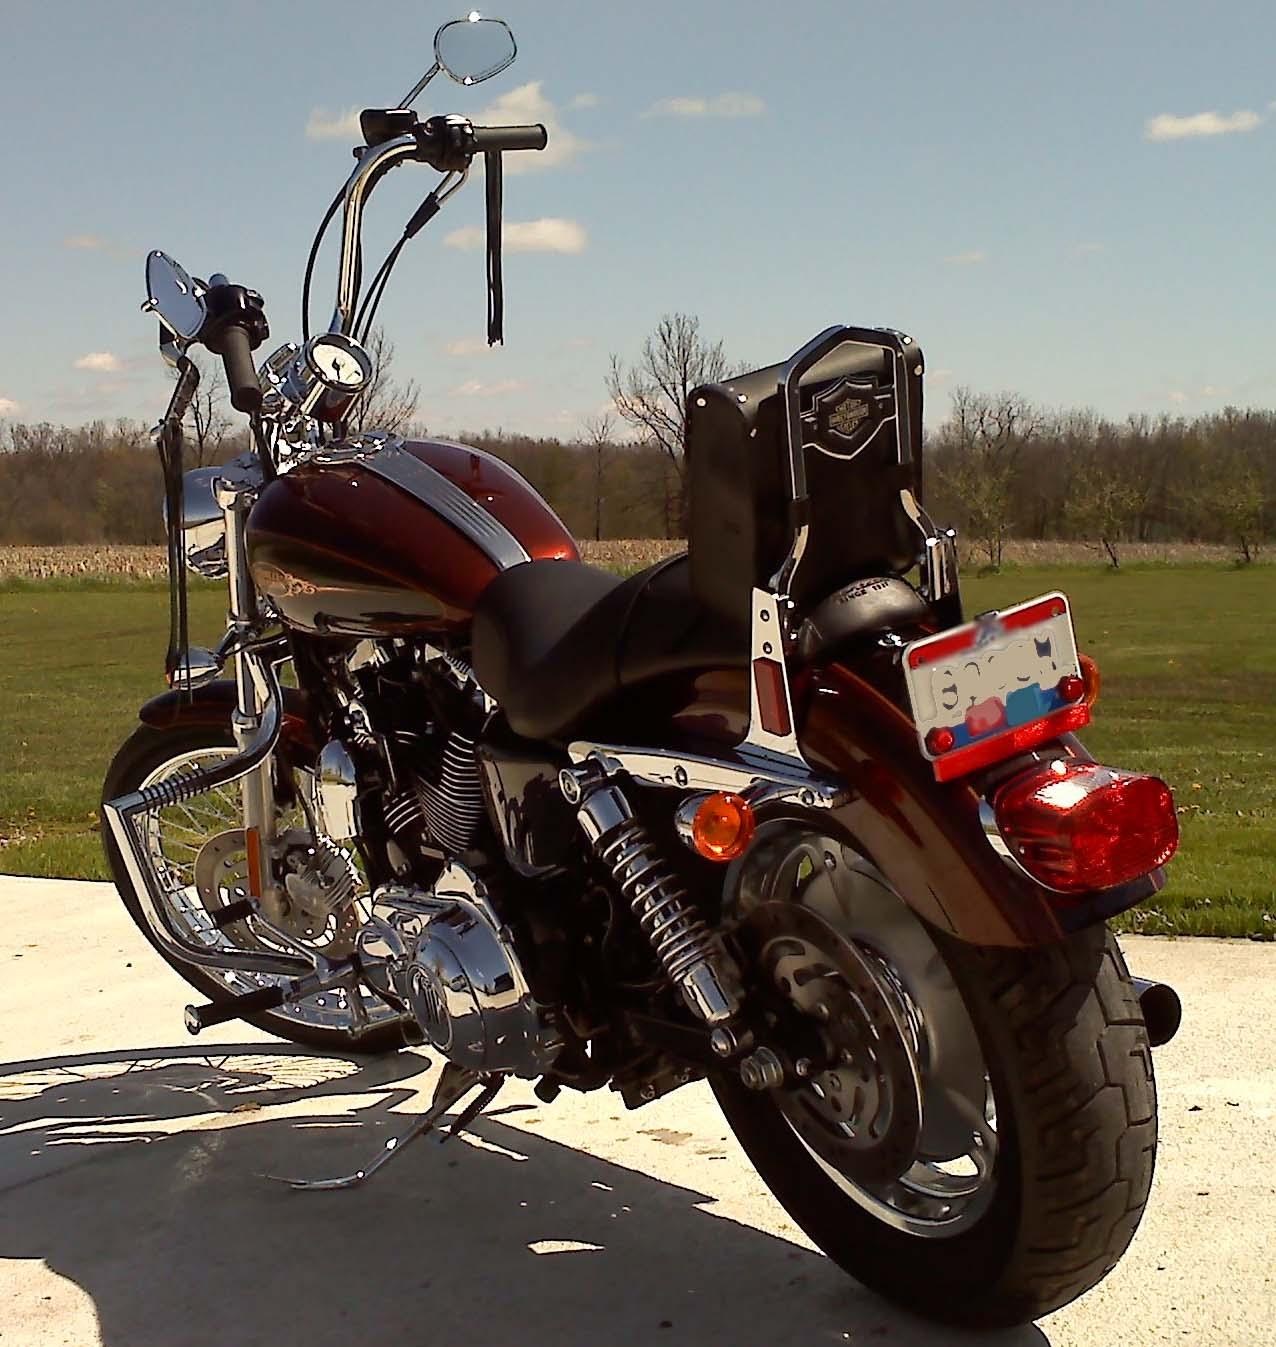 Changing handlebars on your motorcycle